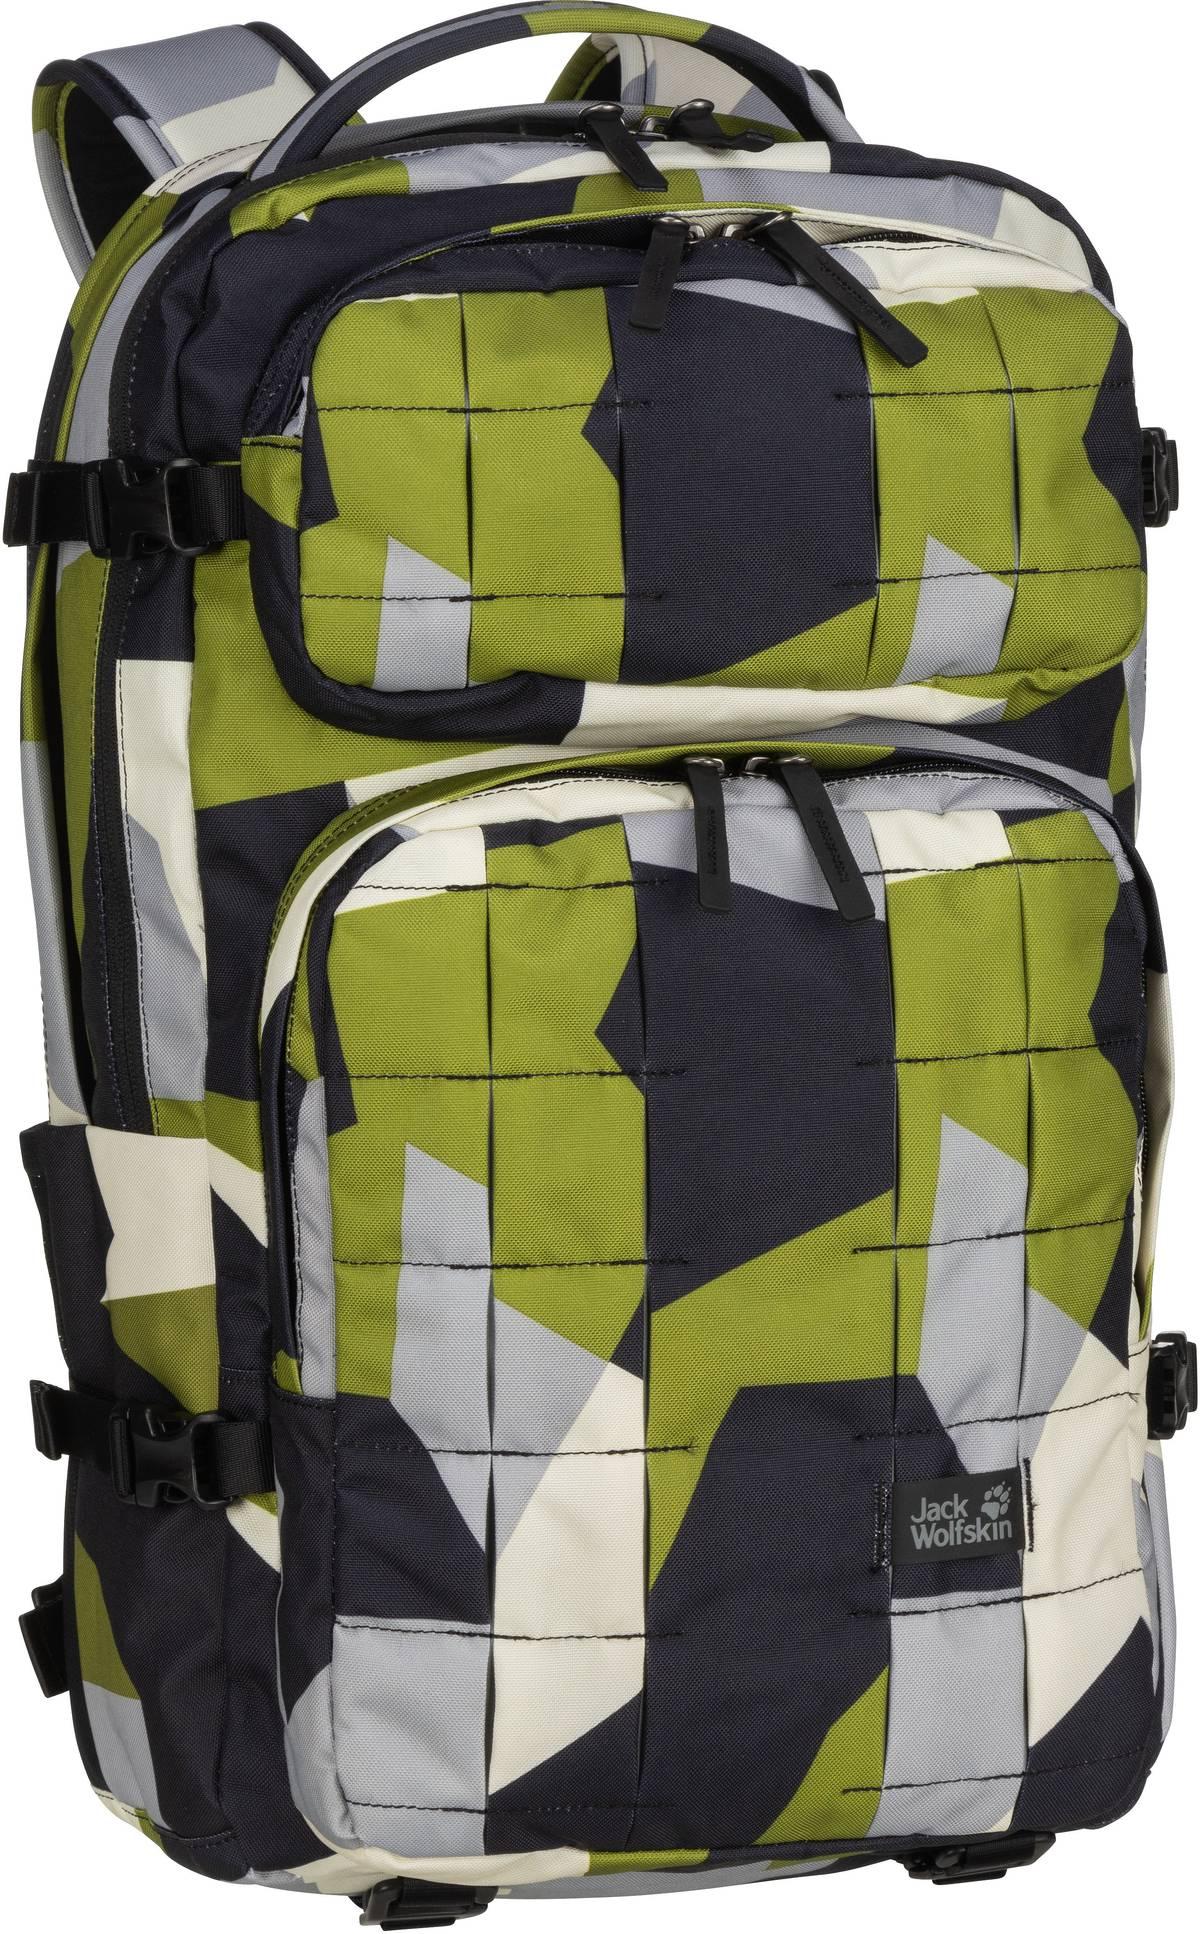 Laptoprucksack TRT 22 Pack Green Geo Block (22 Liter)